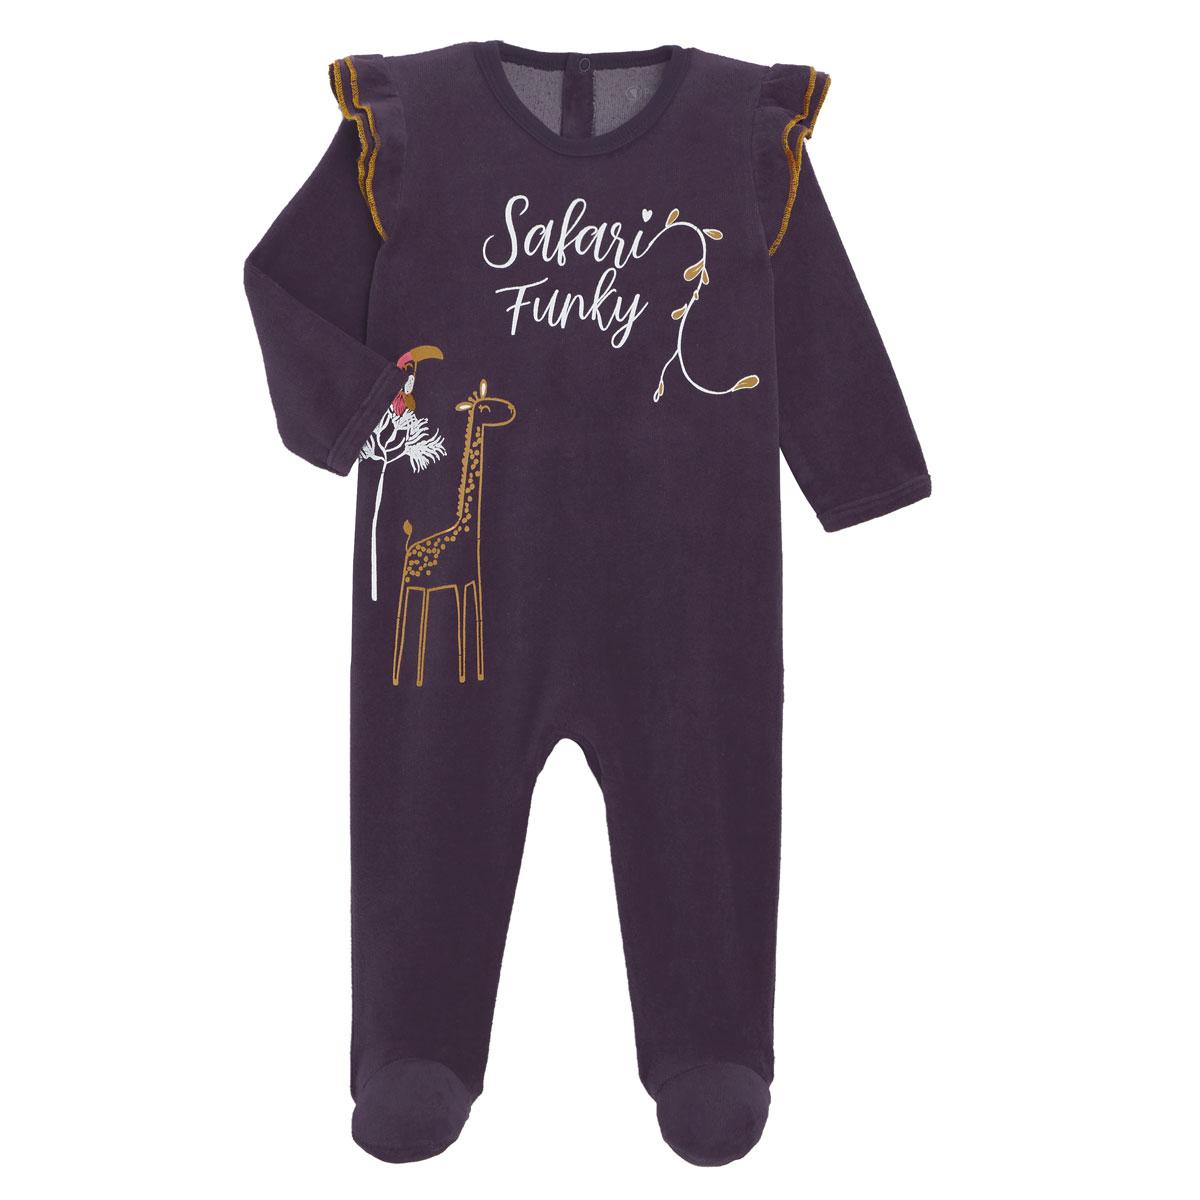 Pyjama bébé en velours contenant du coton bio Funky Safari